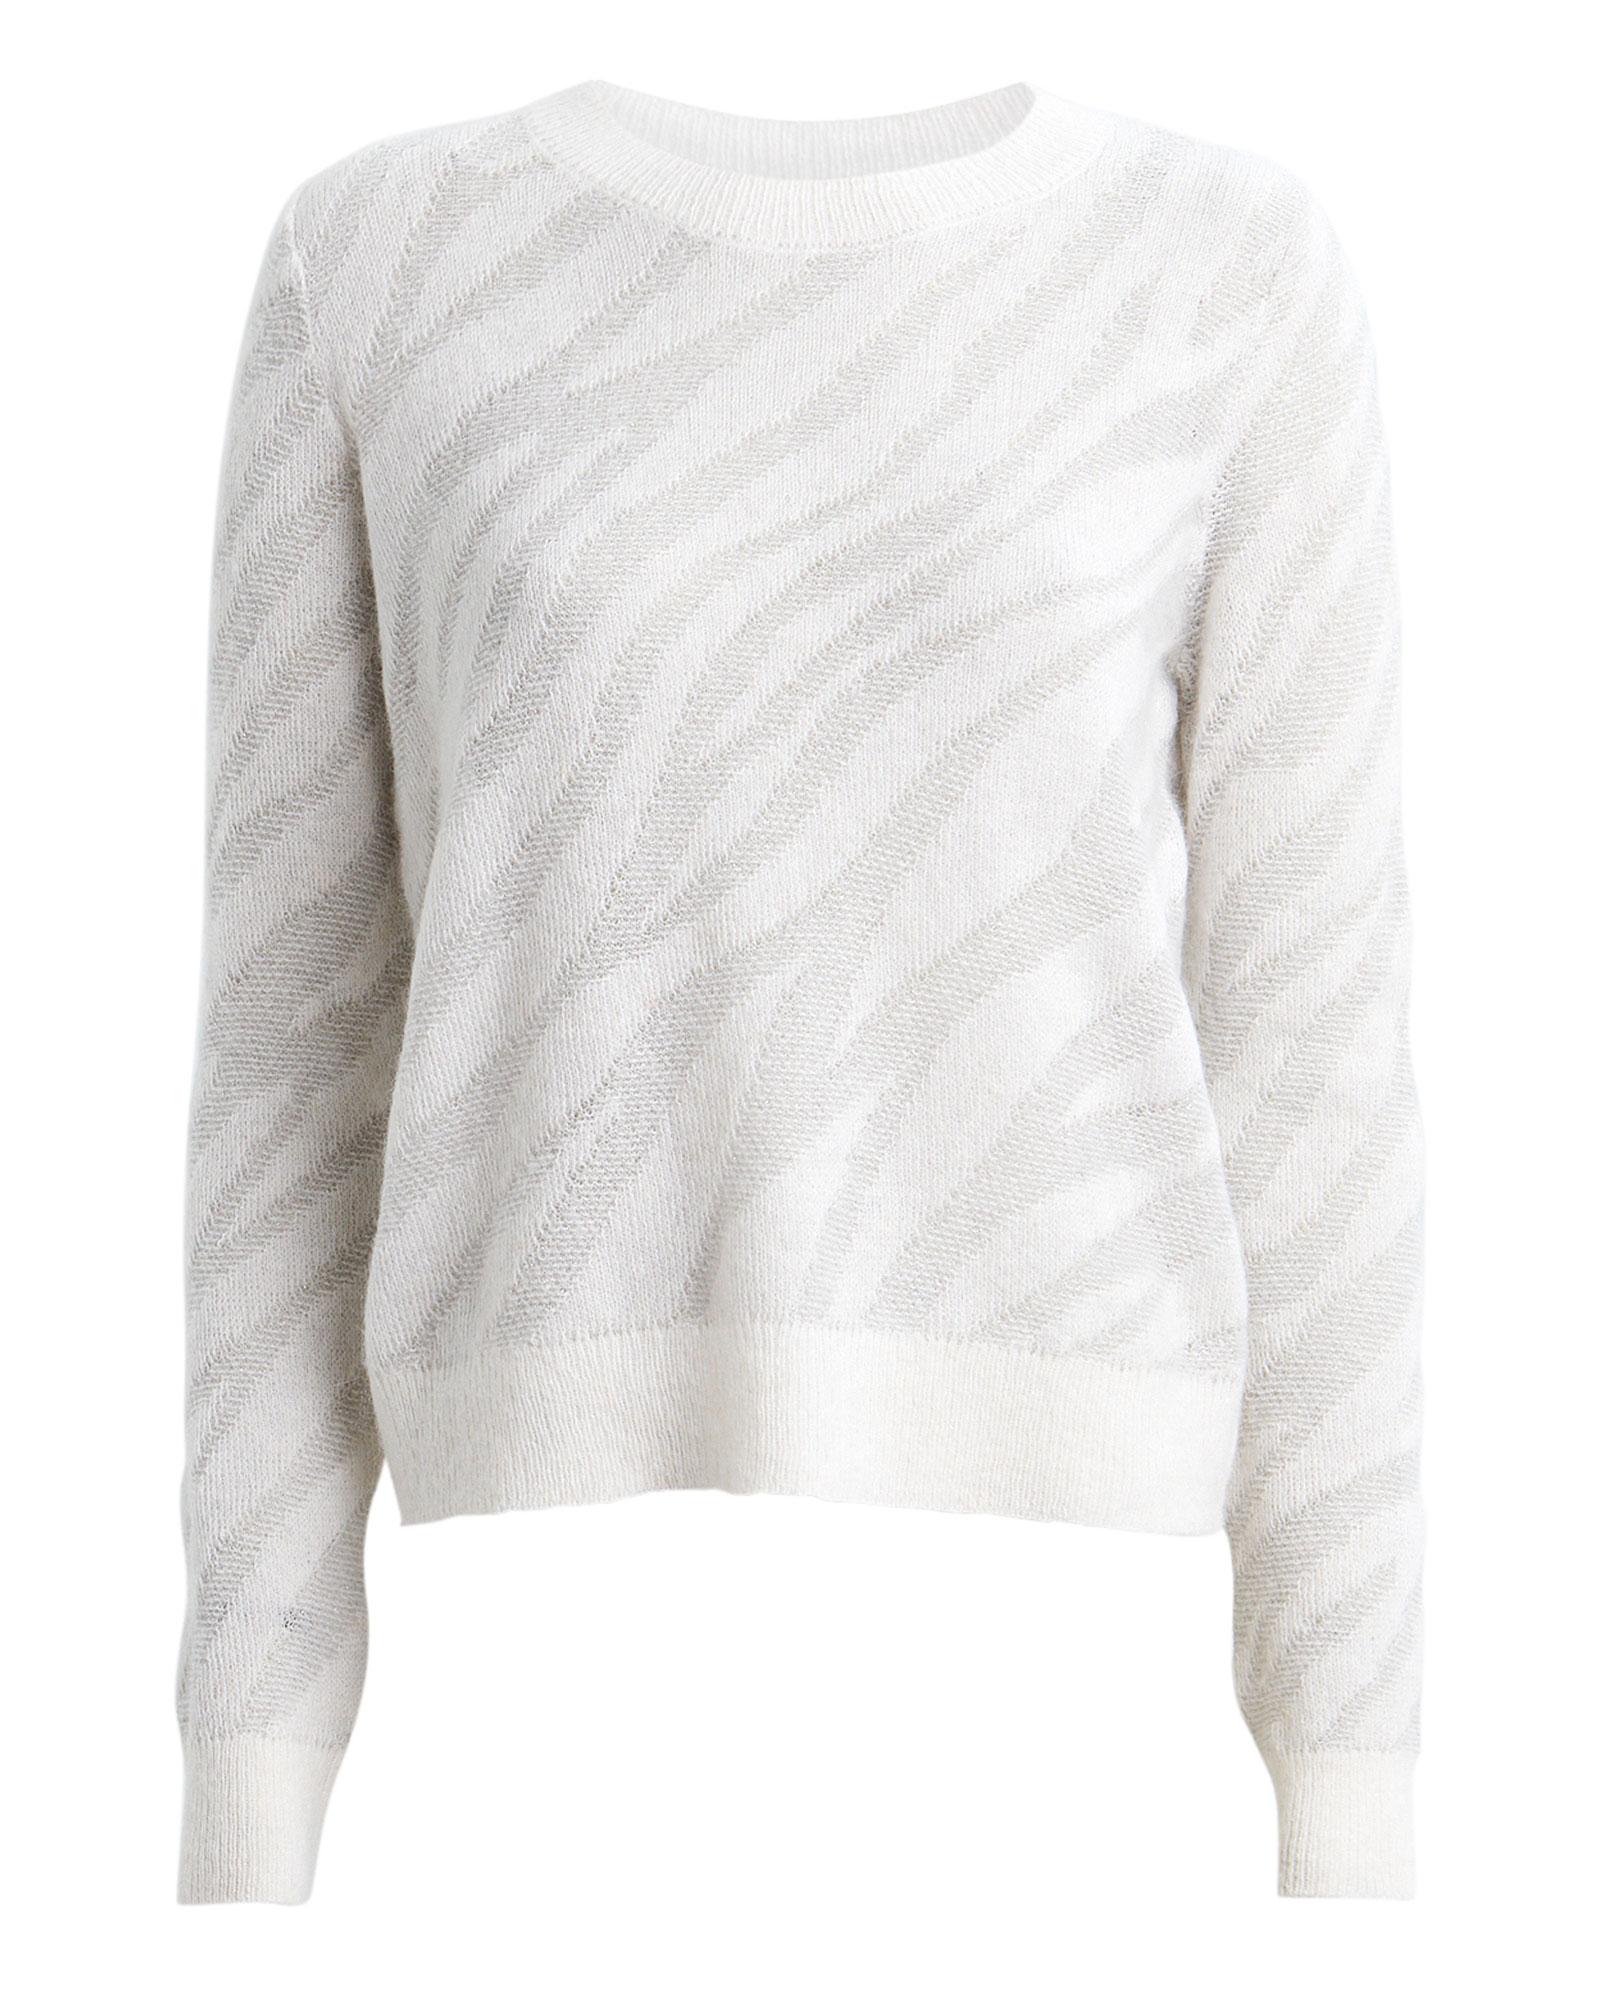 Rag & Bone Sweaters RAG & BONE GERMAINE ZEBRA ALPACA-BLEND SWEATER